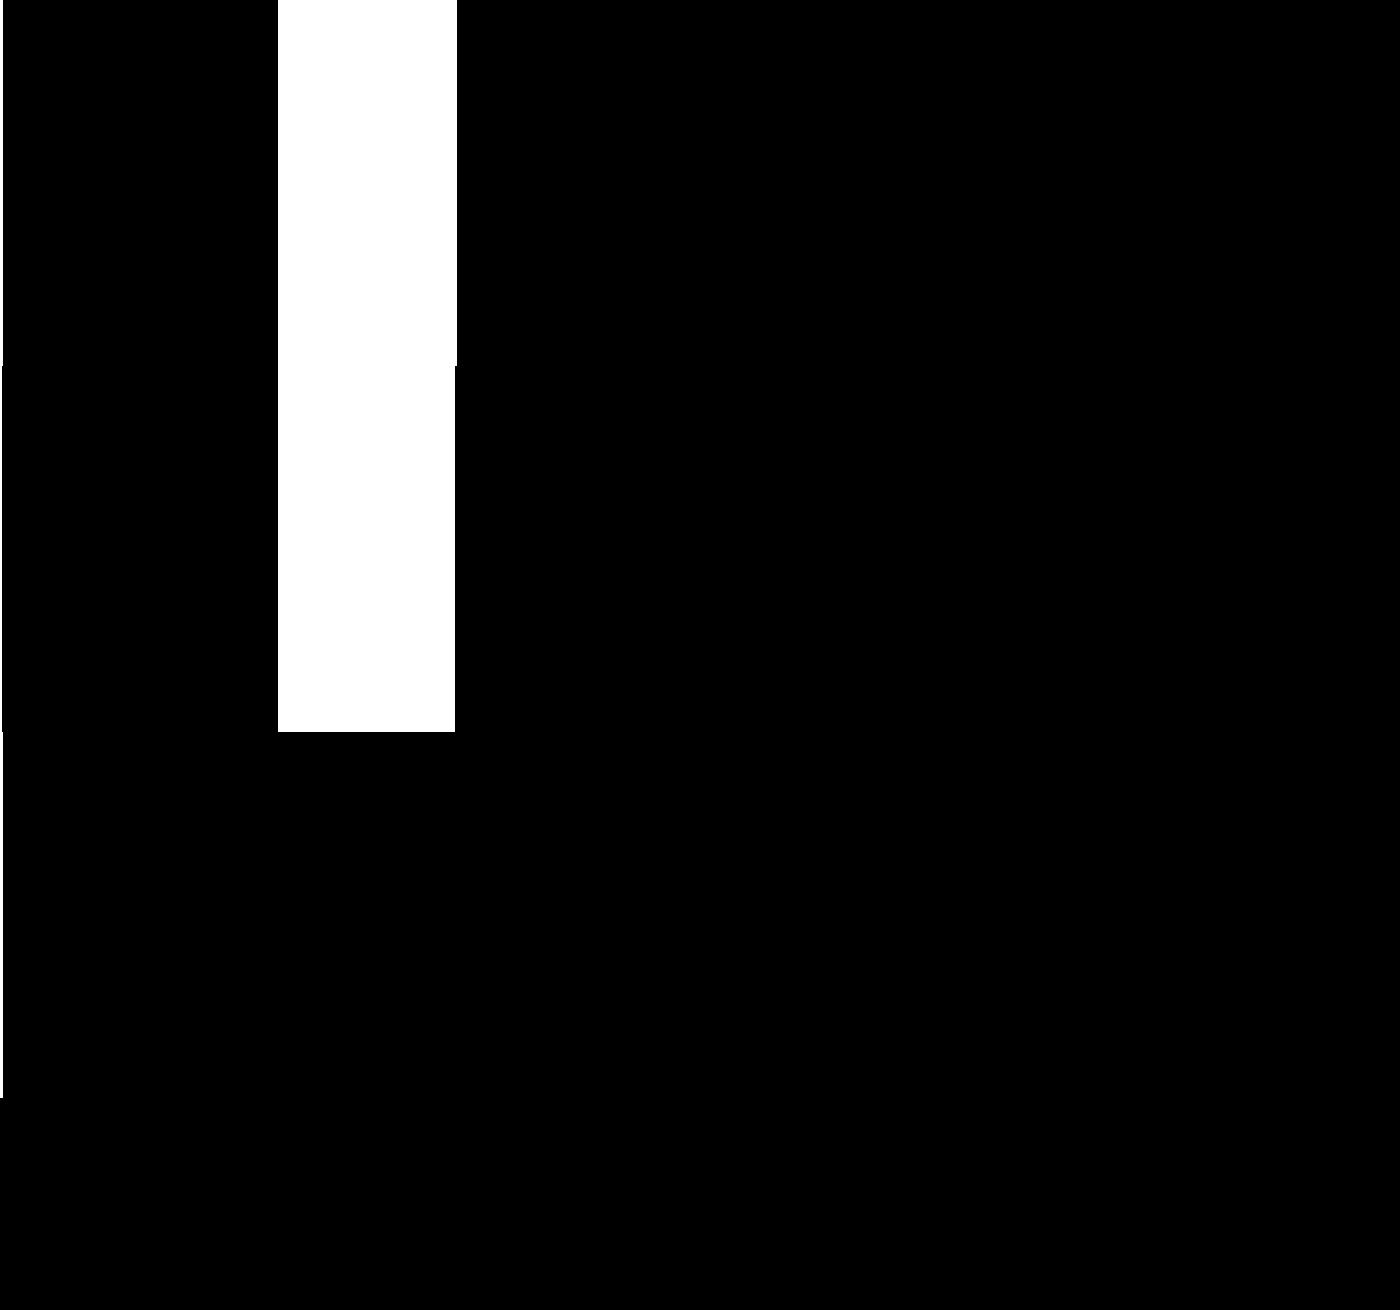 Tonumfang der Holzblasinstrumente